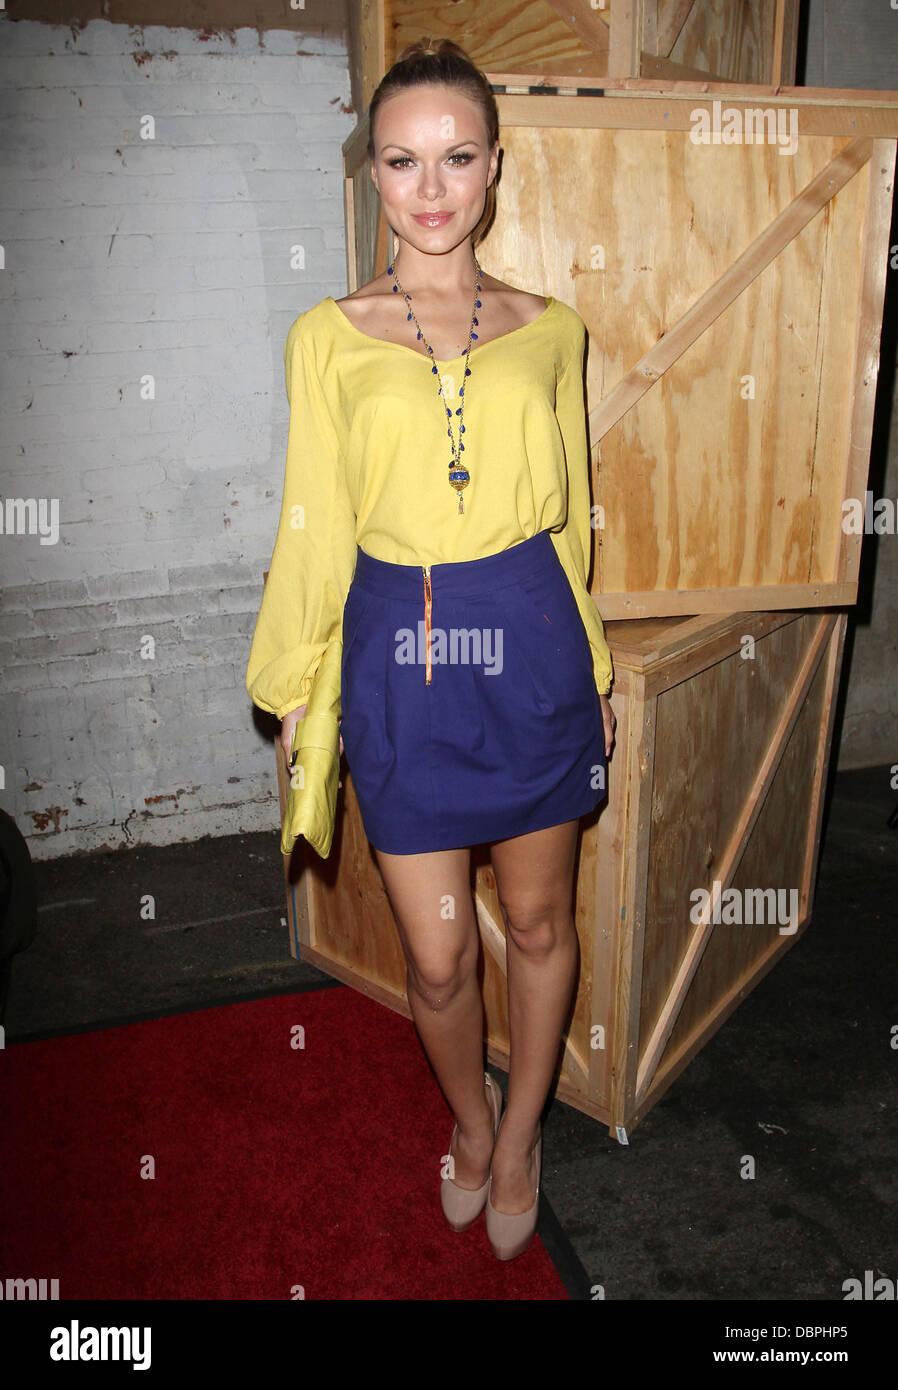 Anya Monzikova Revolution By LG/Verizon Party Held at The Sayers Club Hollywood, California - 17.08.11 - Stock Image